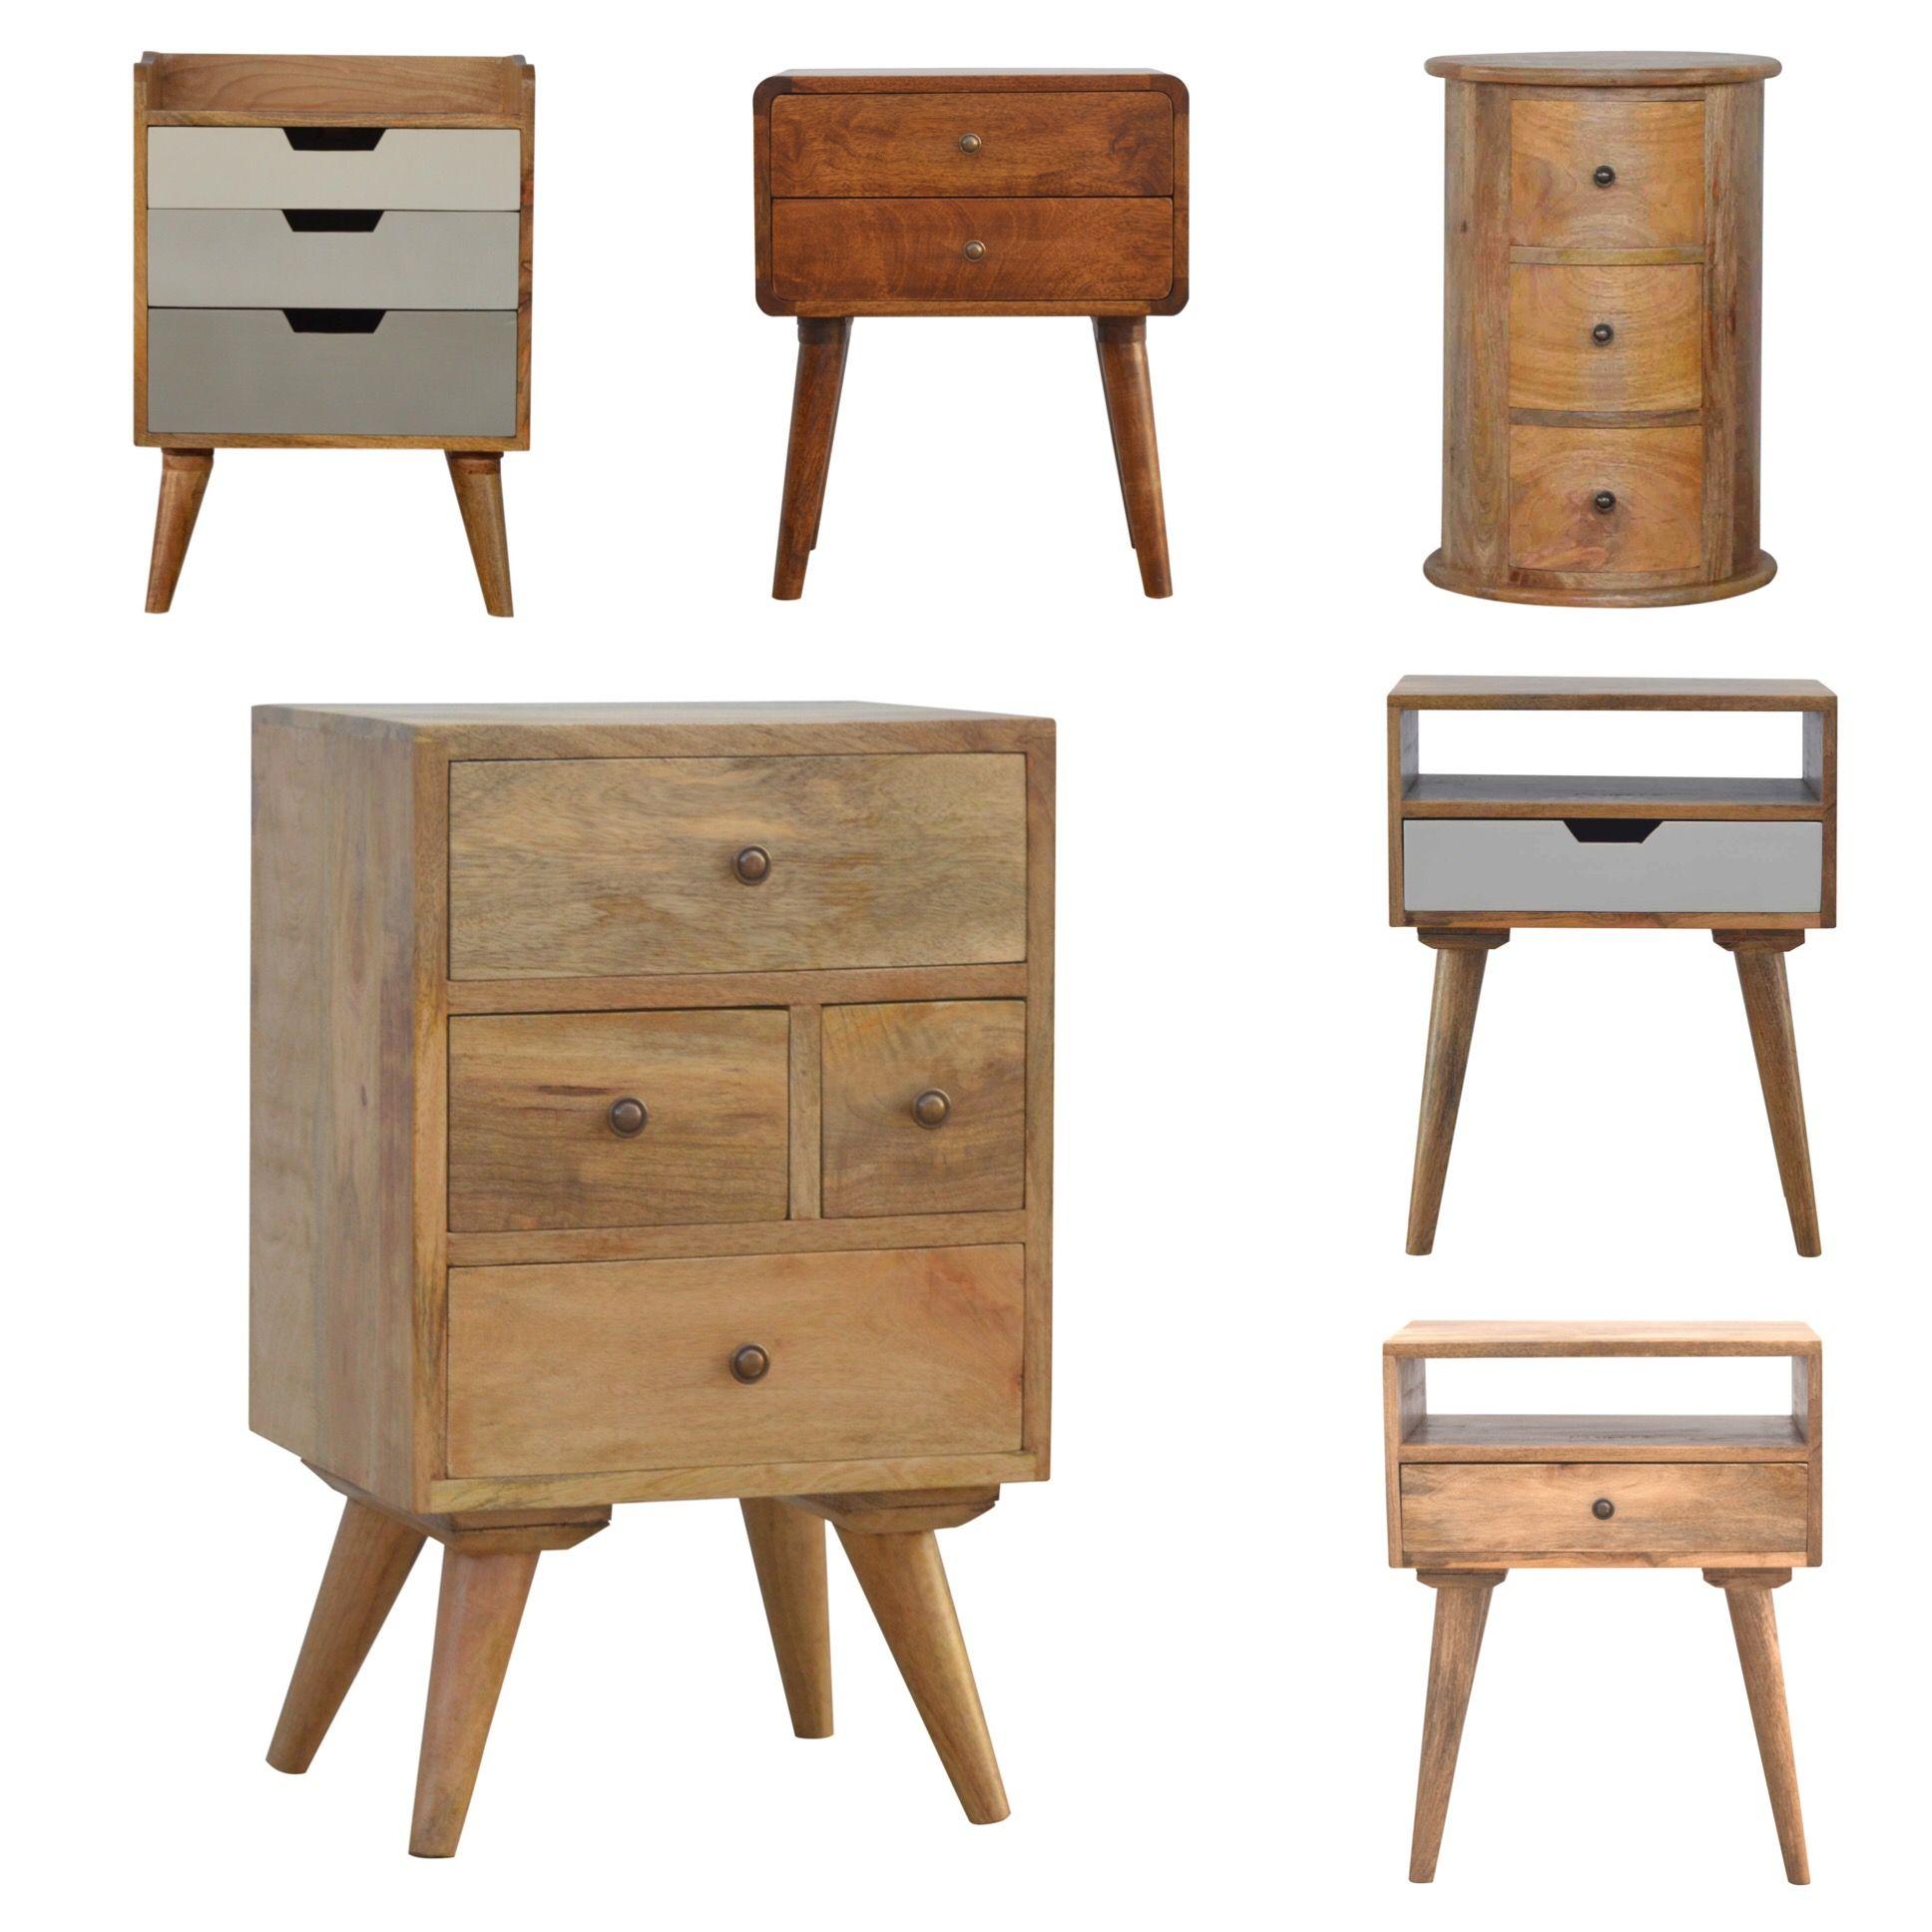 Wondrous Interesting Cabinets Lago Home Wholesale Furniture Download Free Architecture Designs Scobabritishbridgeorg